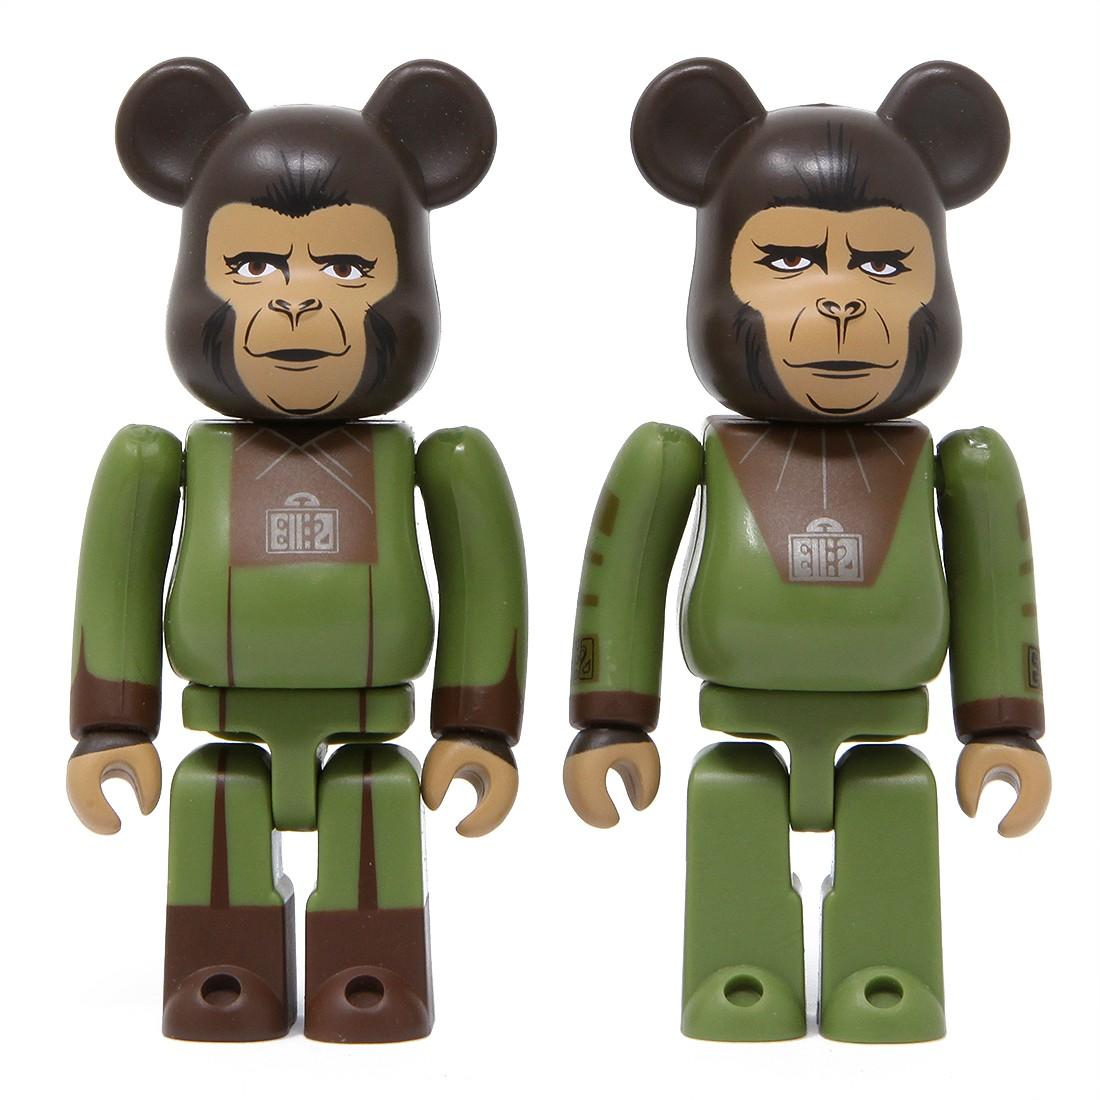 Medicom Planet Of The Apes Cornelius And Zira 100% Bearbrick Figure 2 Pack Set (green)